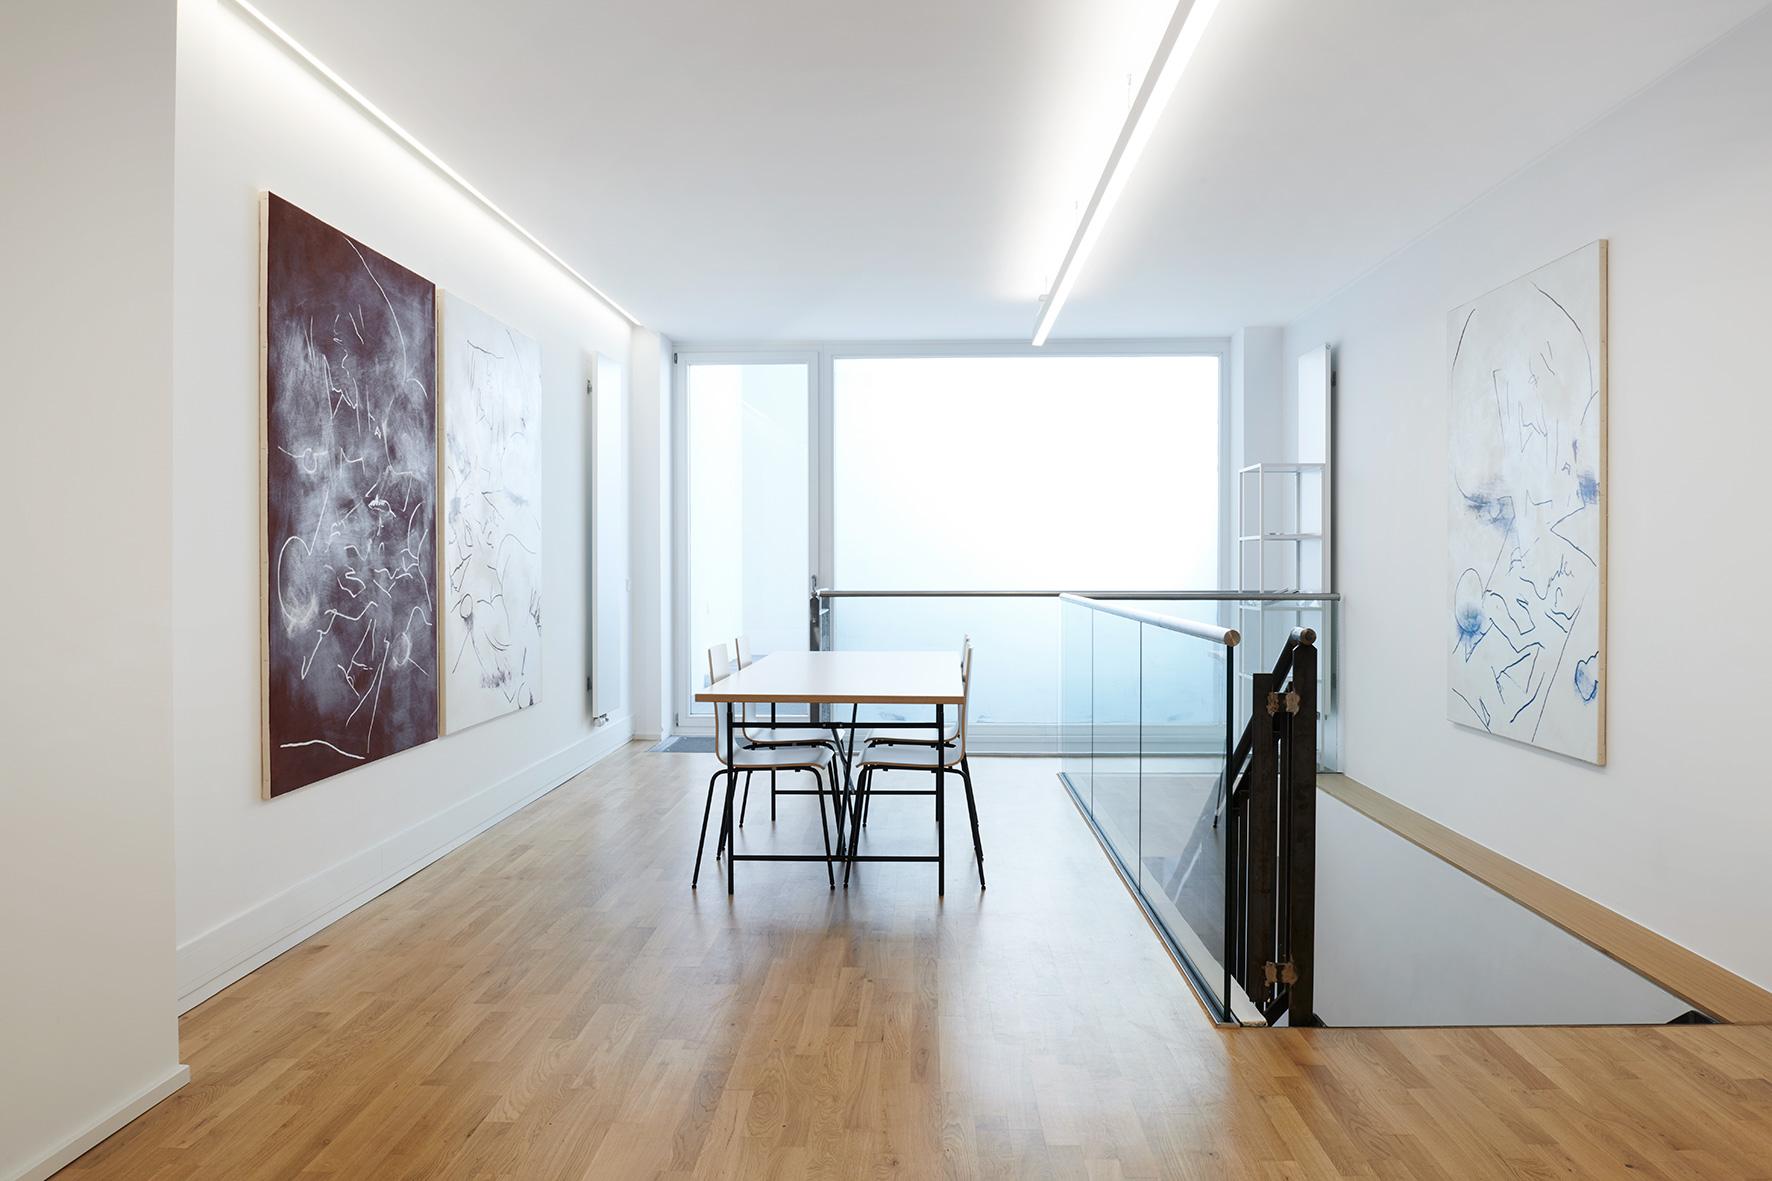 2019.03.19_Galerie-Alber_06.web.jpg